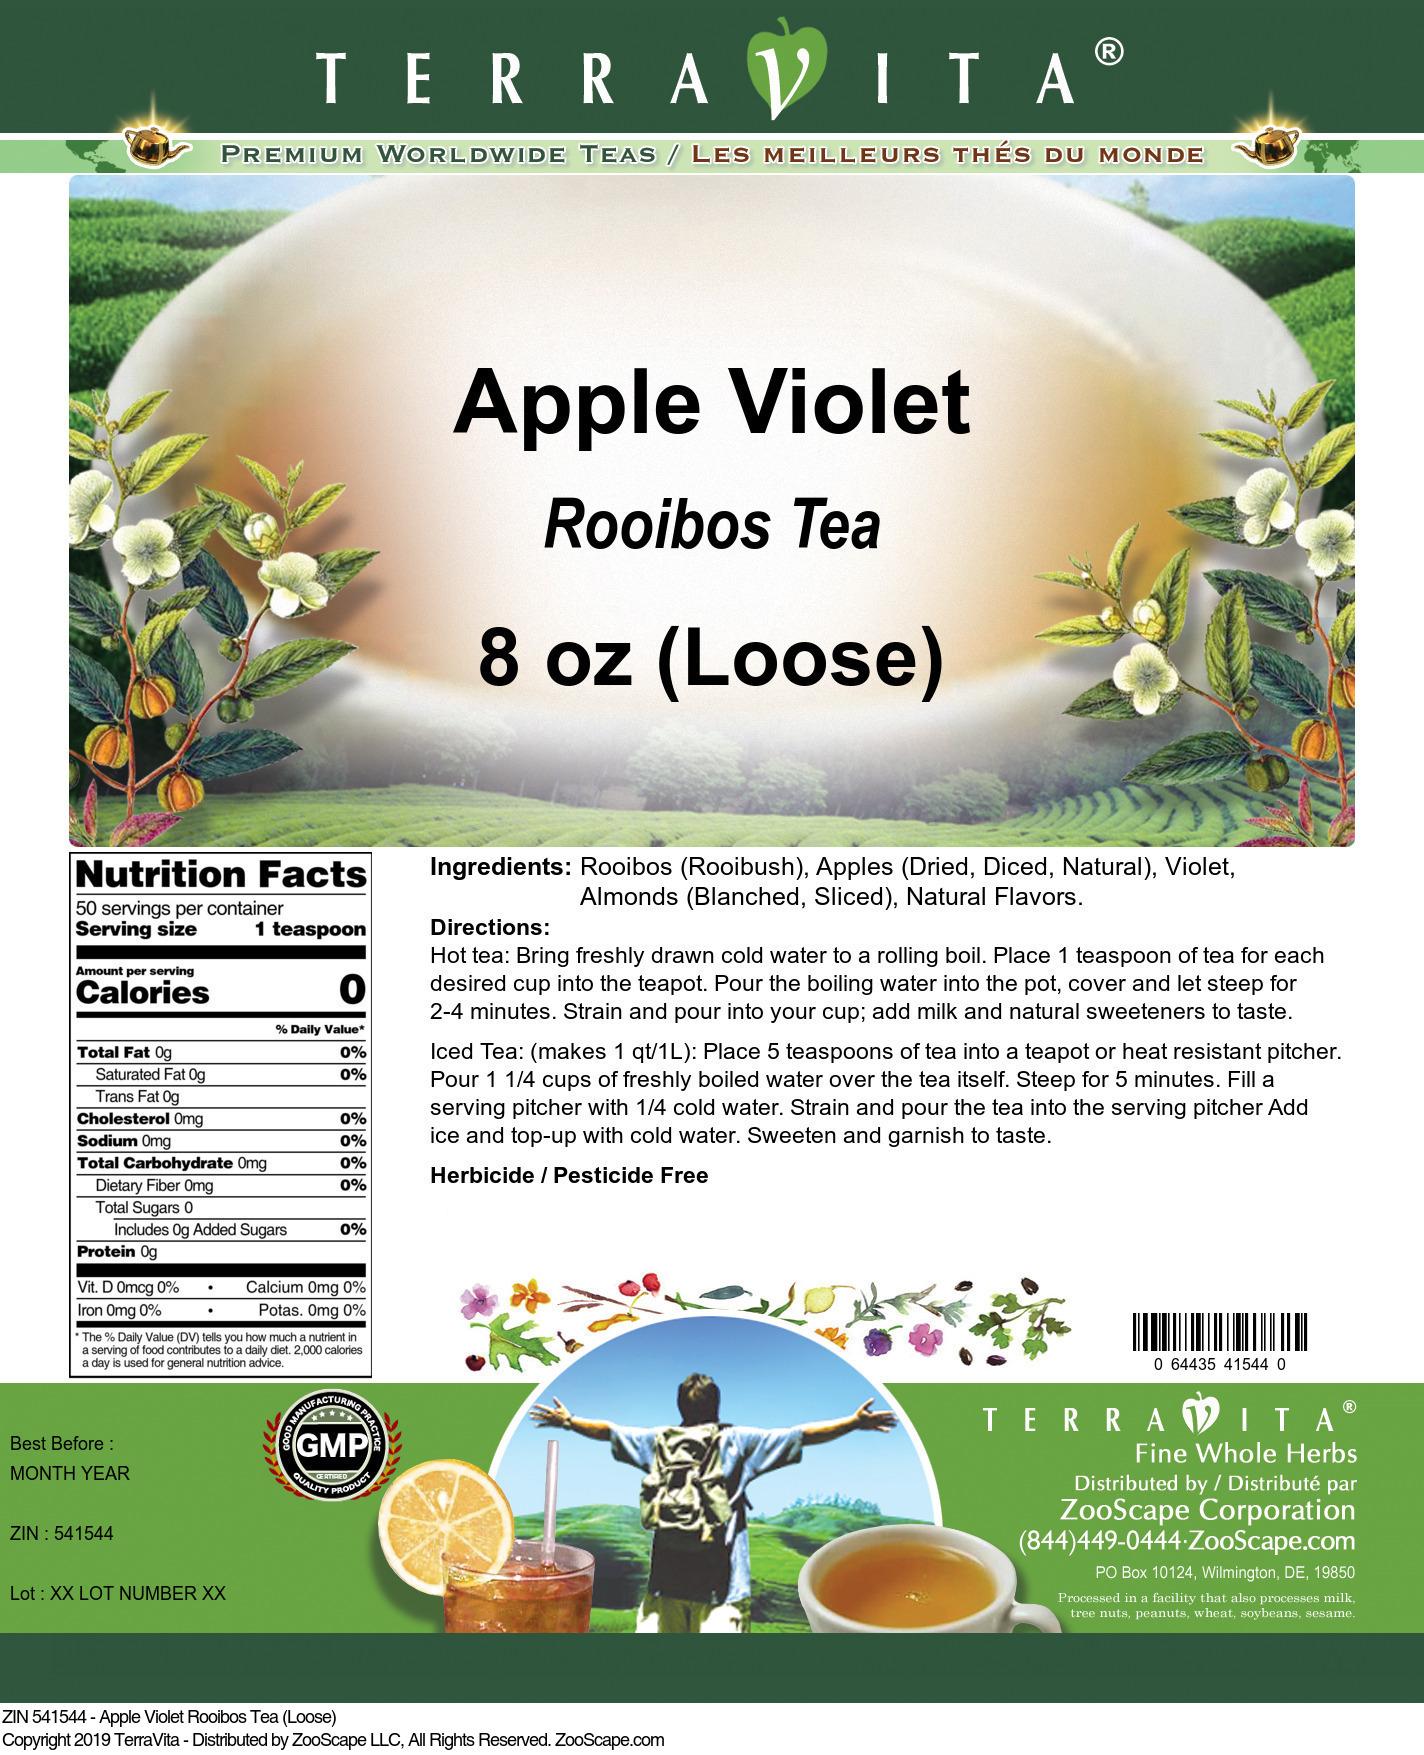 Apple Violet Rooibos Tea (Loose)